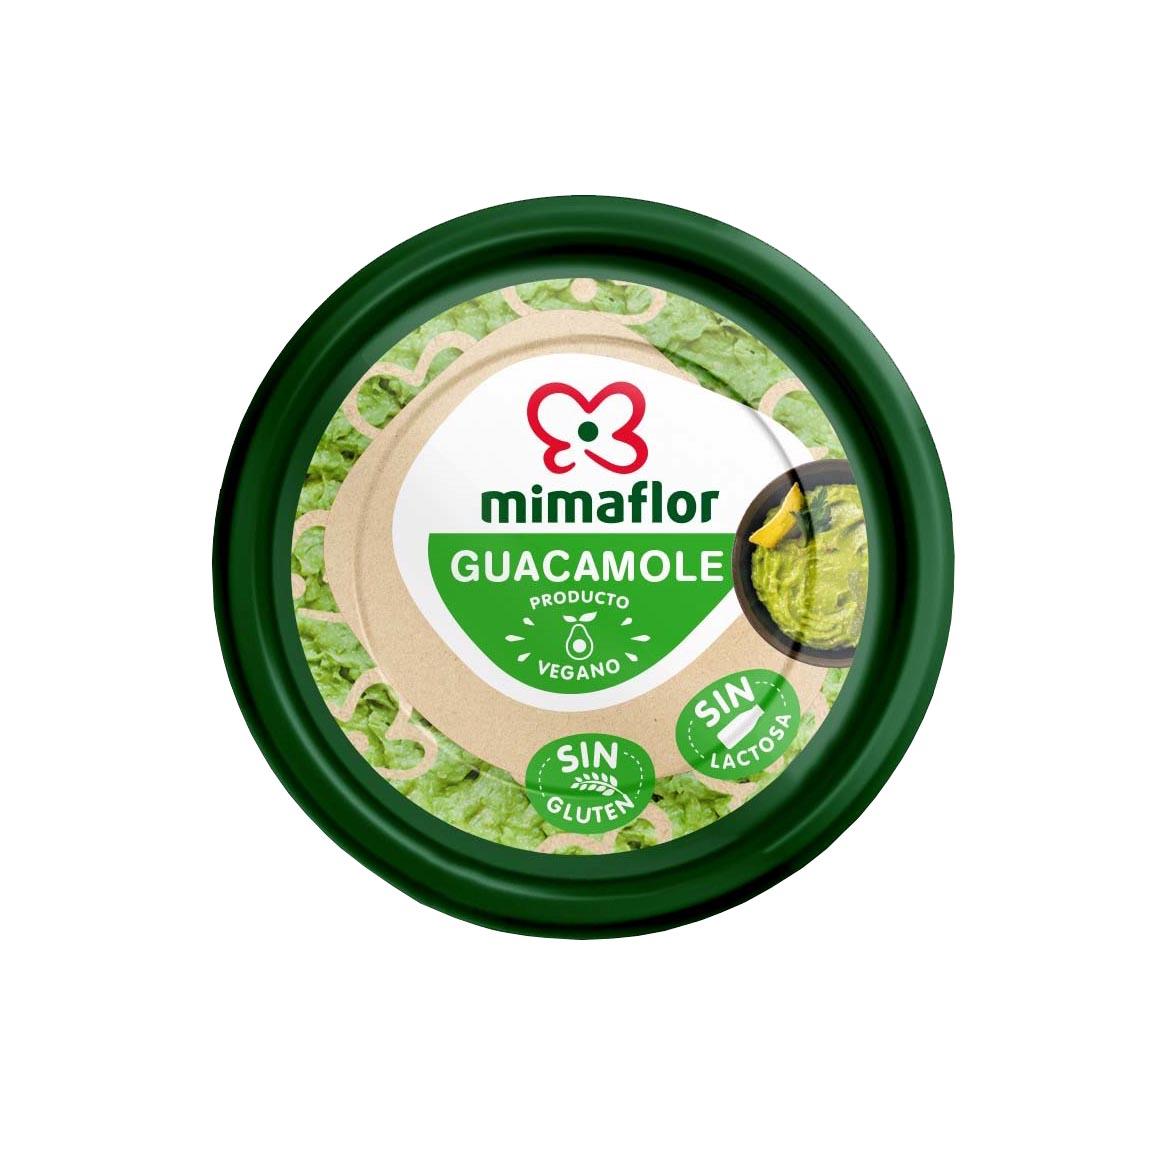 guacamole suave mimaflor